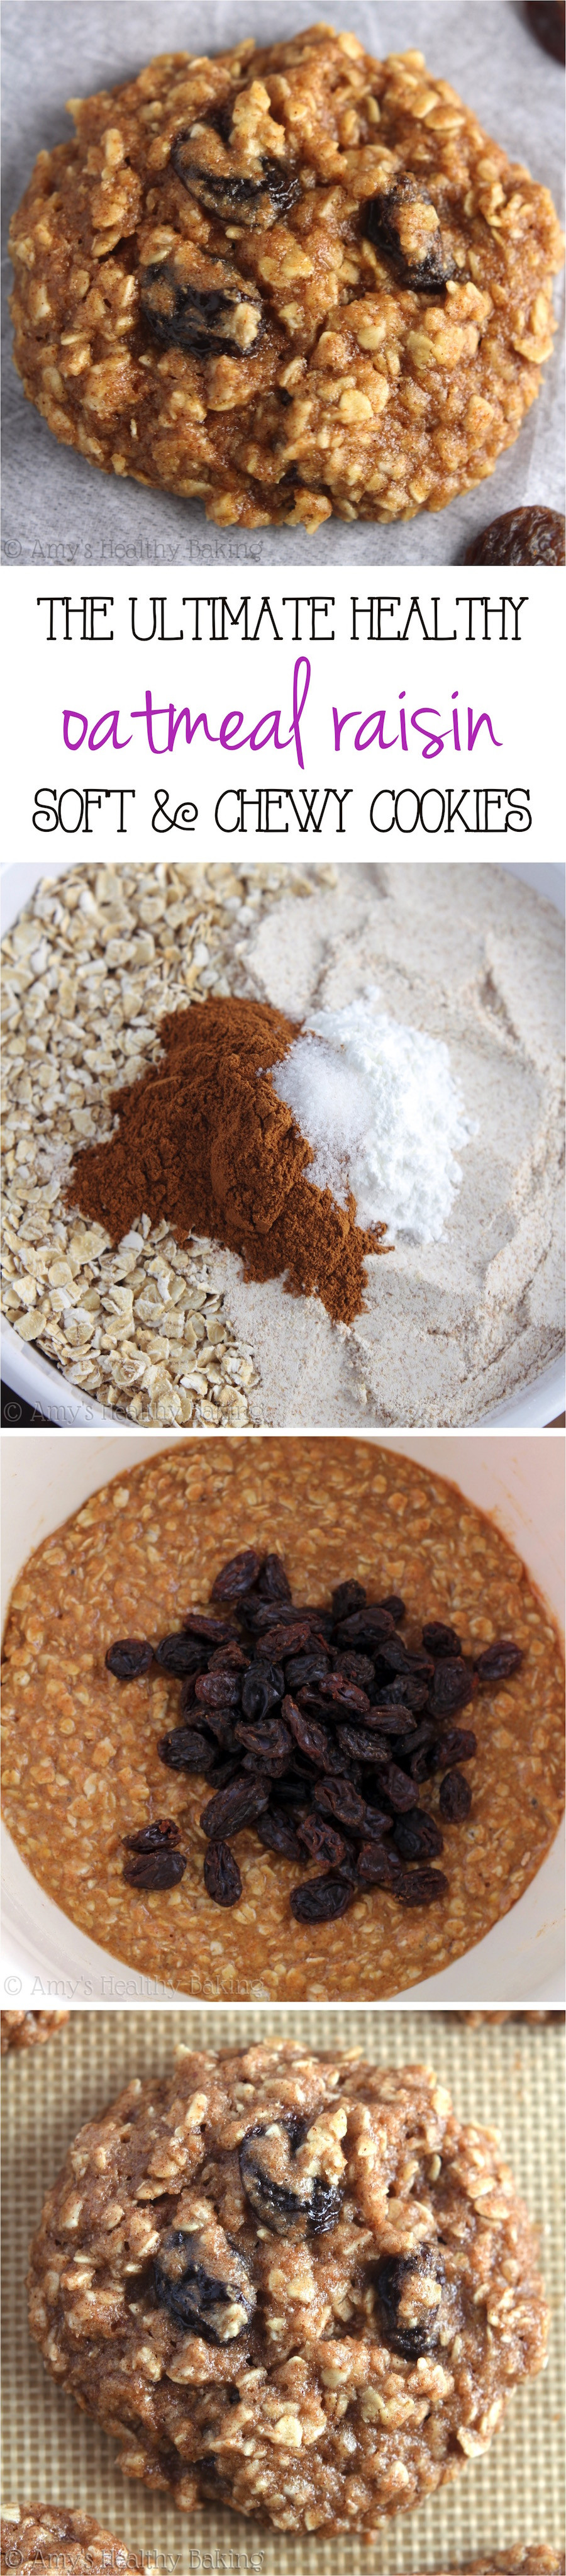 Ultimate Oatmeal Raisin Cookies  ultimate oatmeal cookie recipe